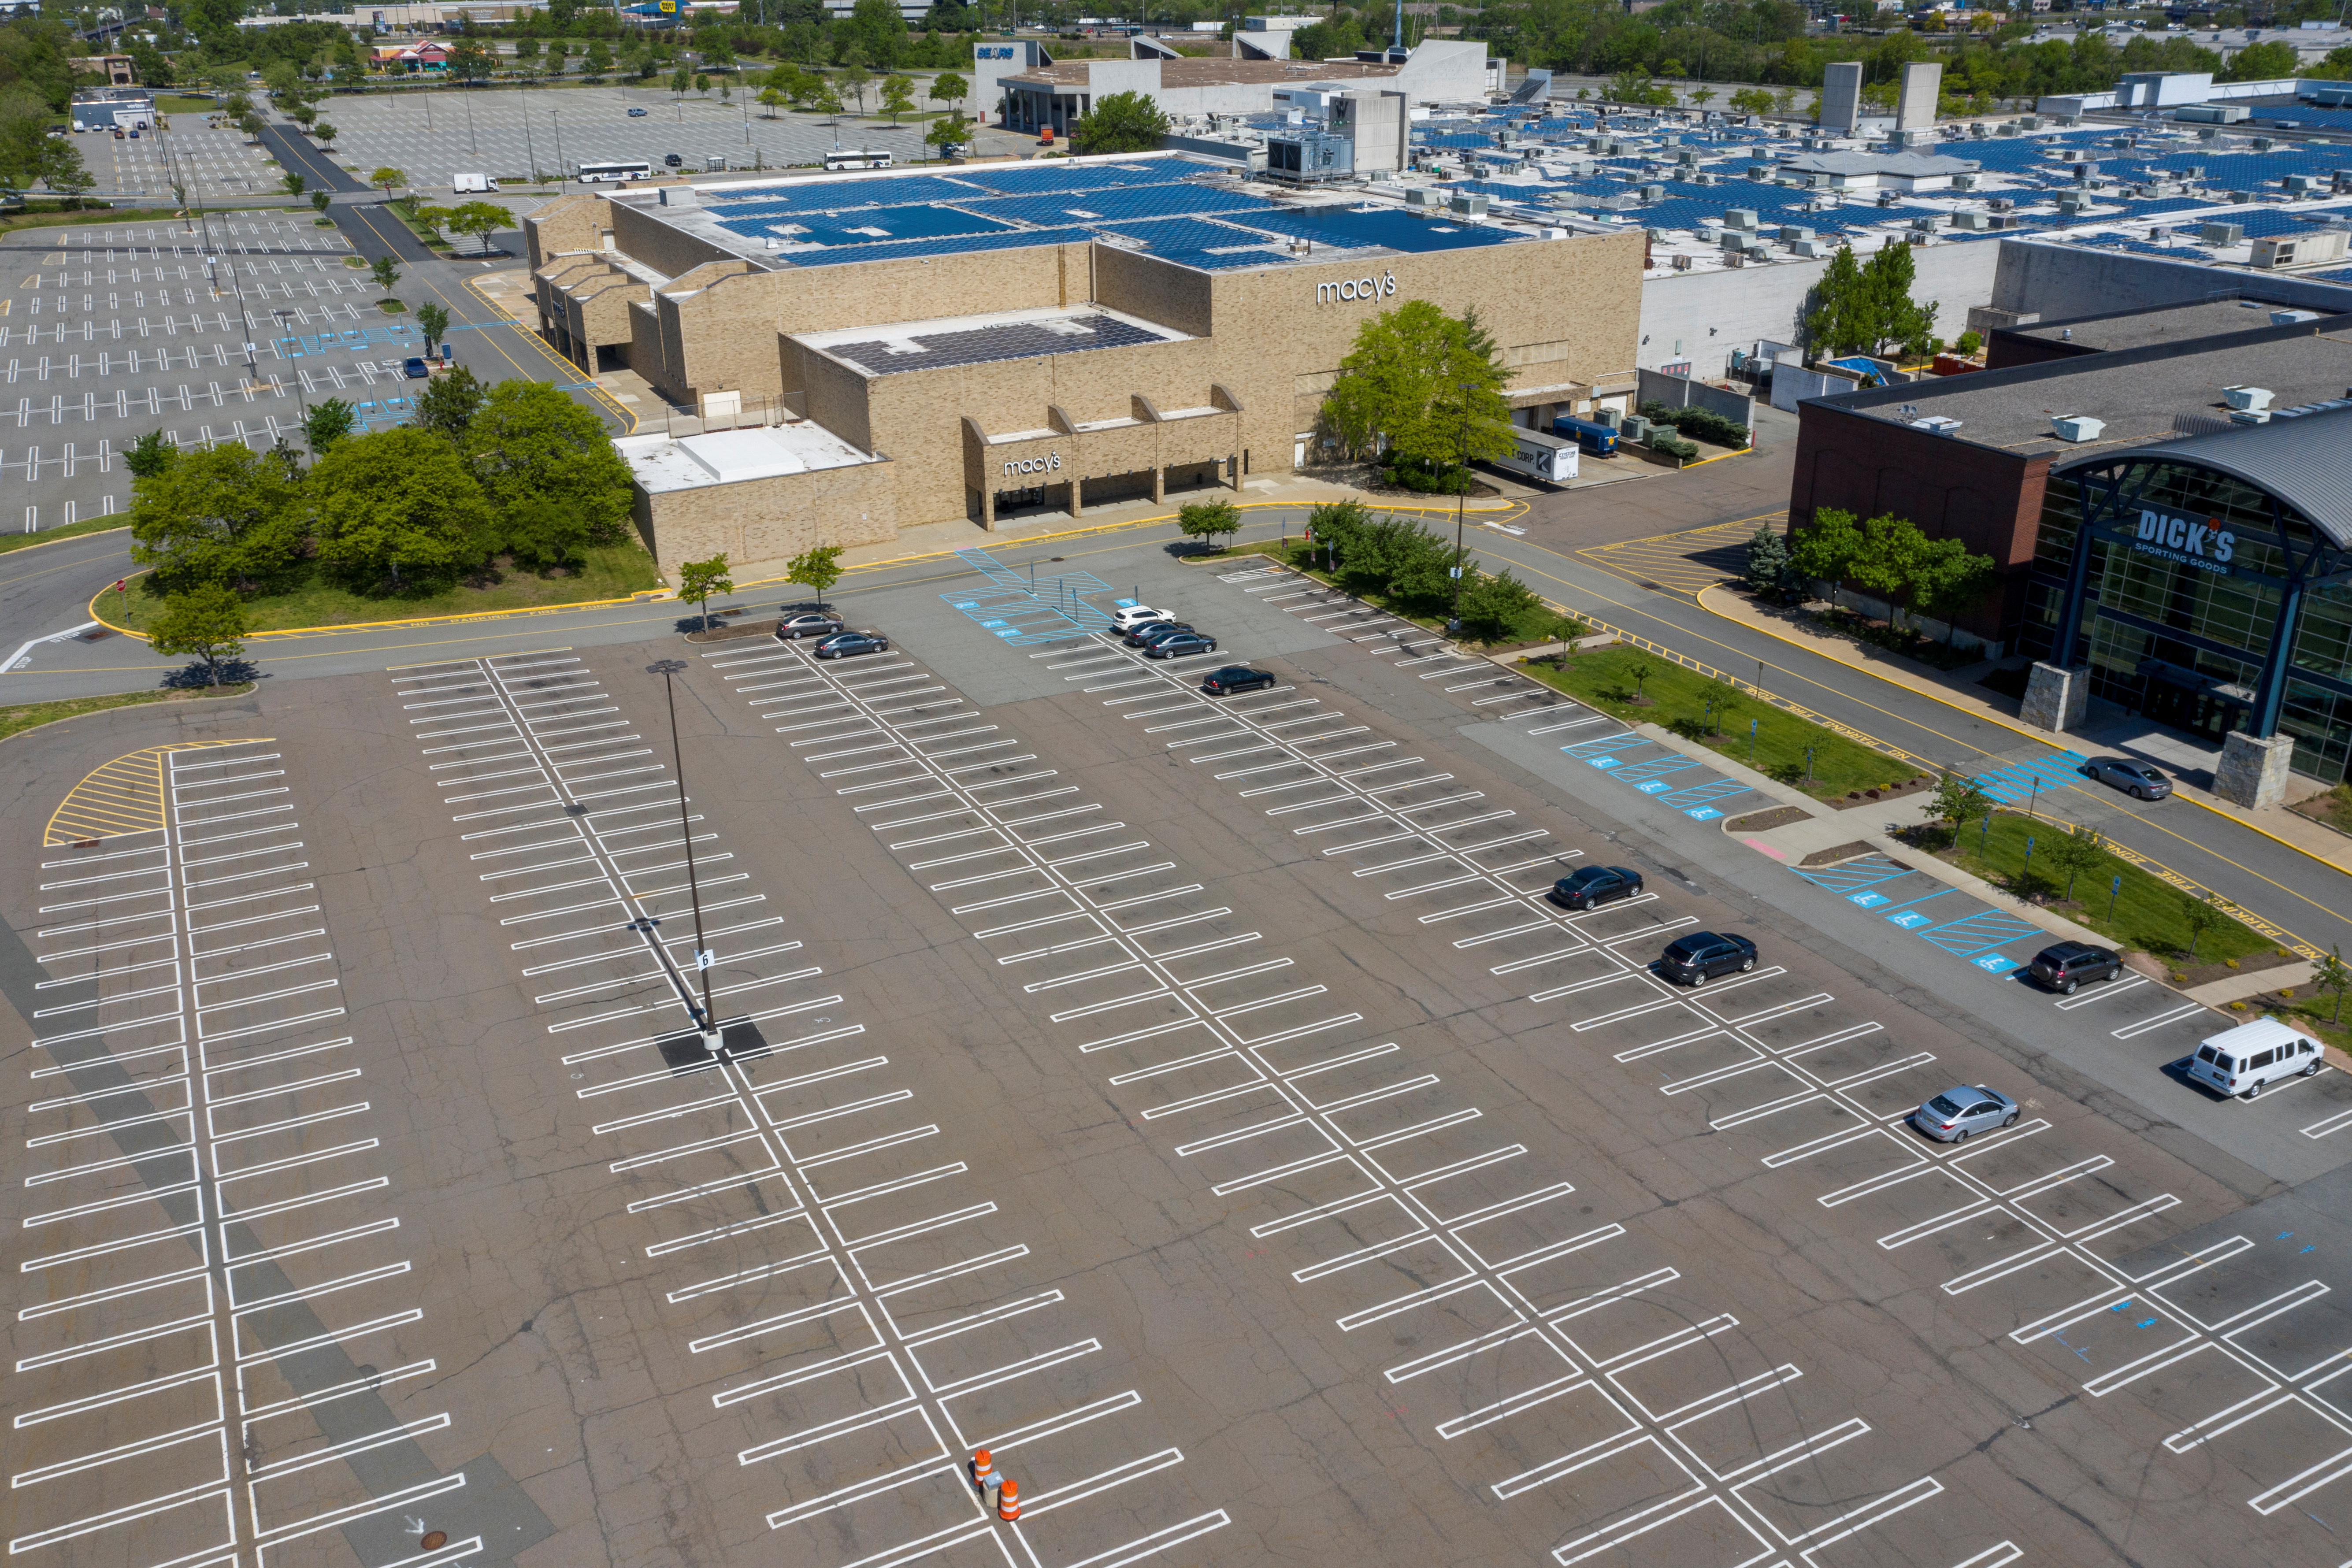 Un centro comercial casi vacío en Woodbridge Township, New Jersey (REUTERS/Lucas Jackson)